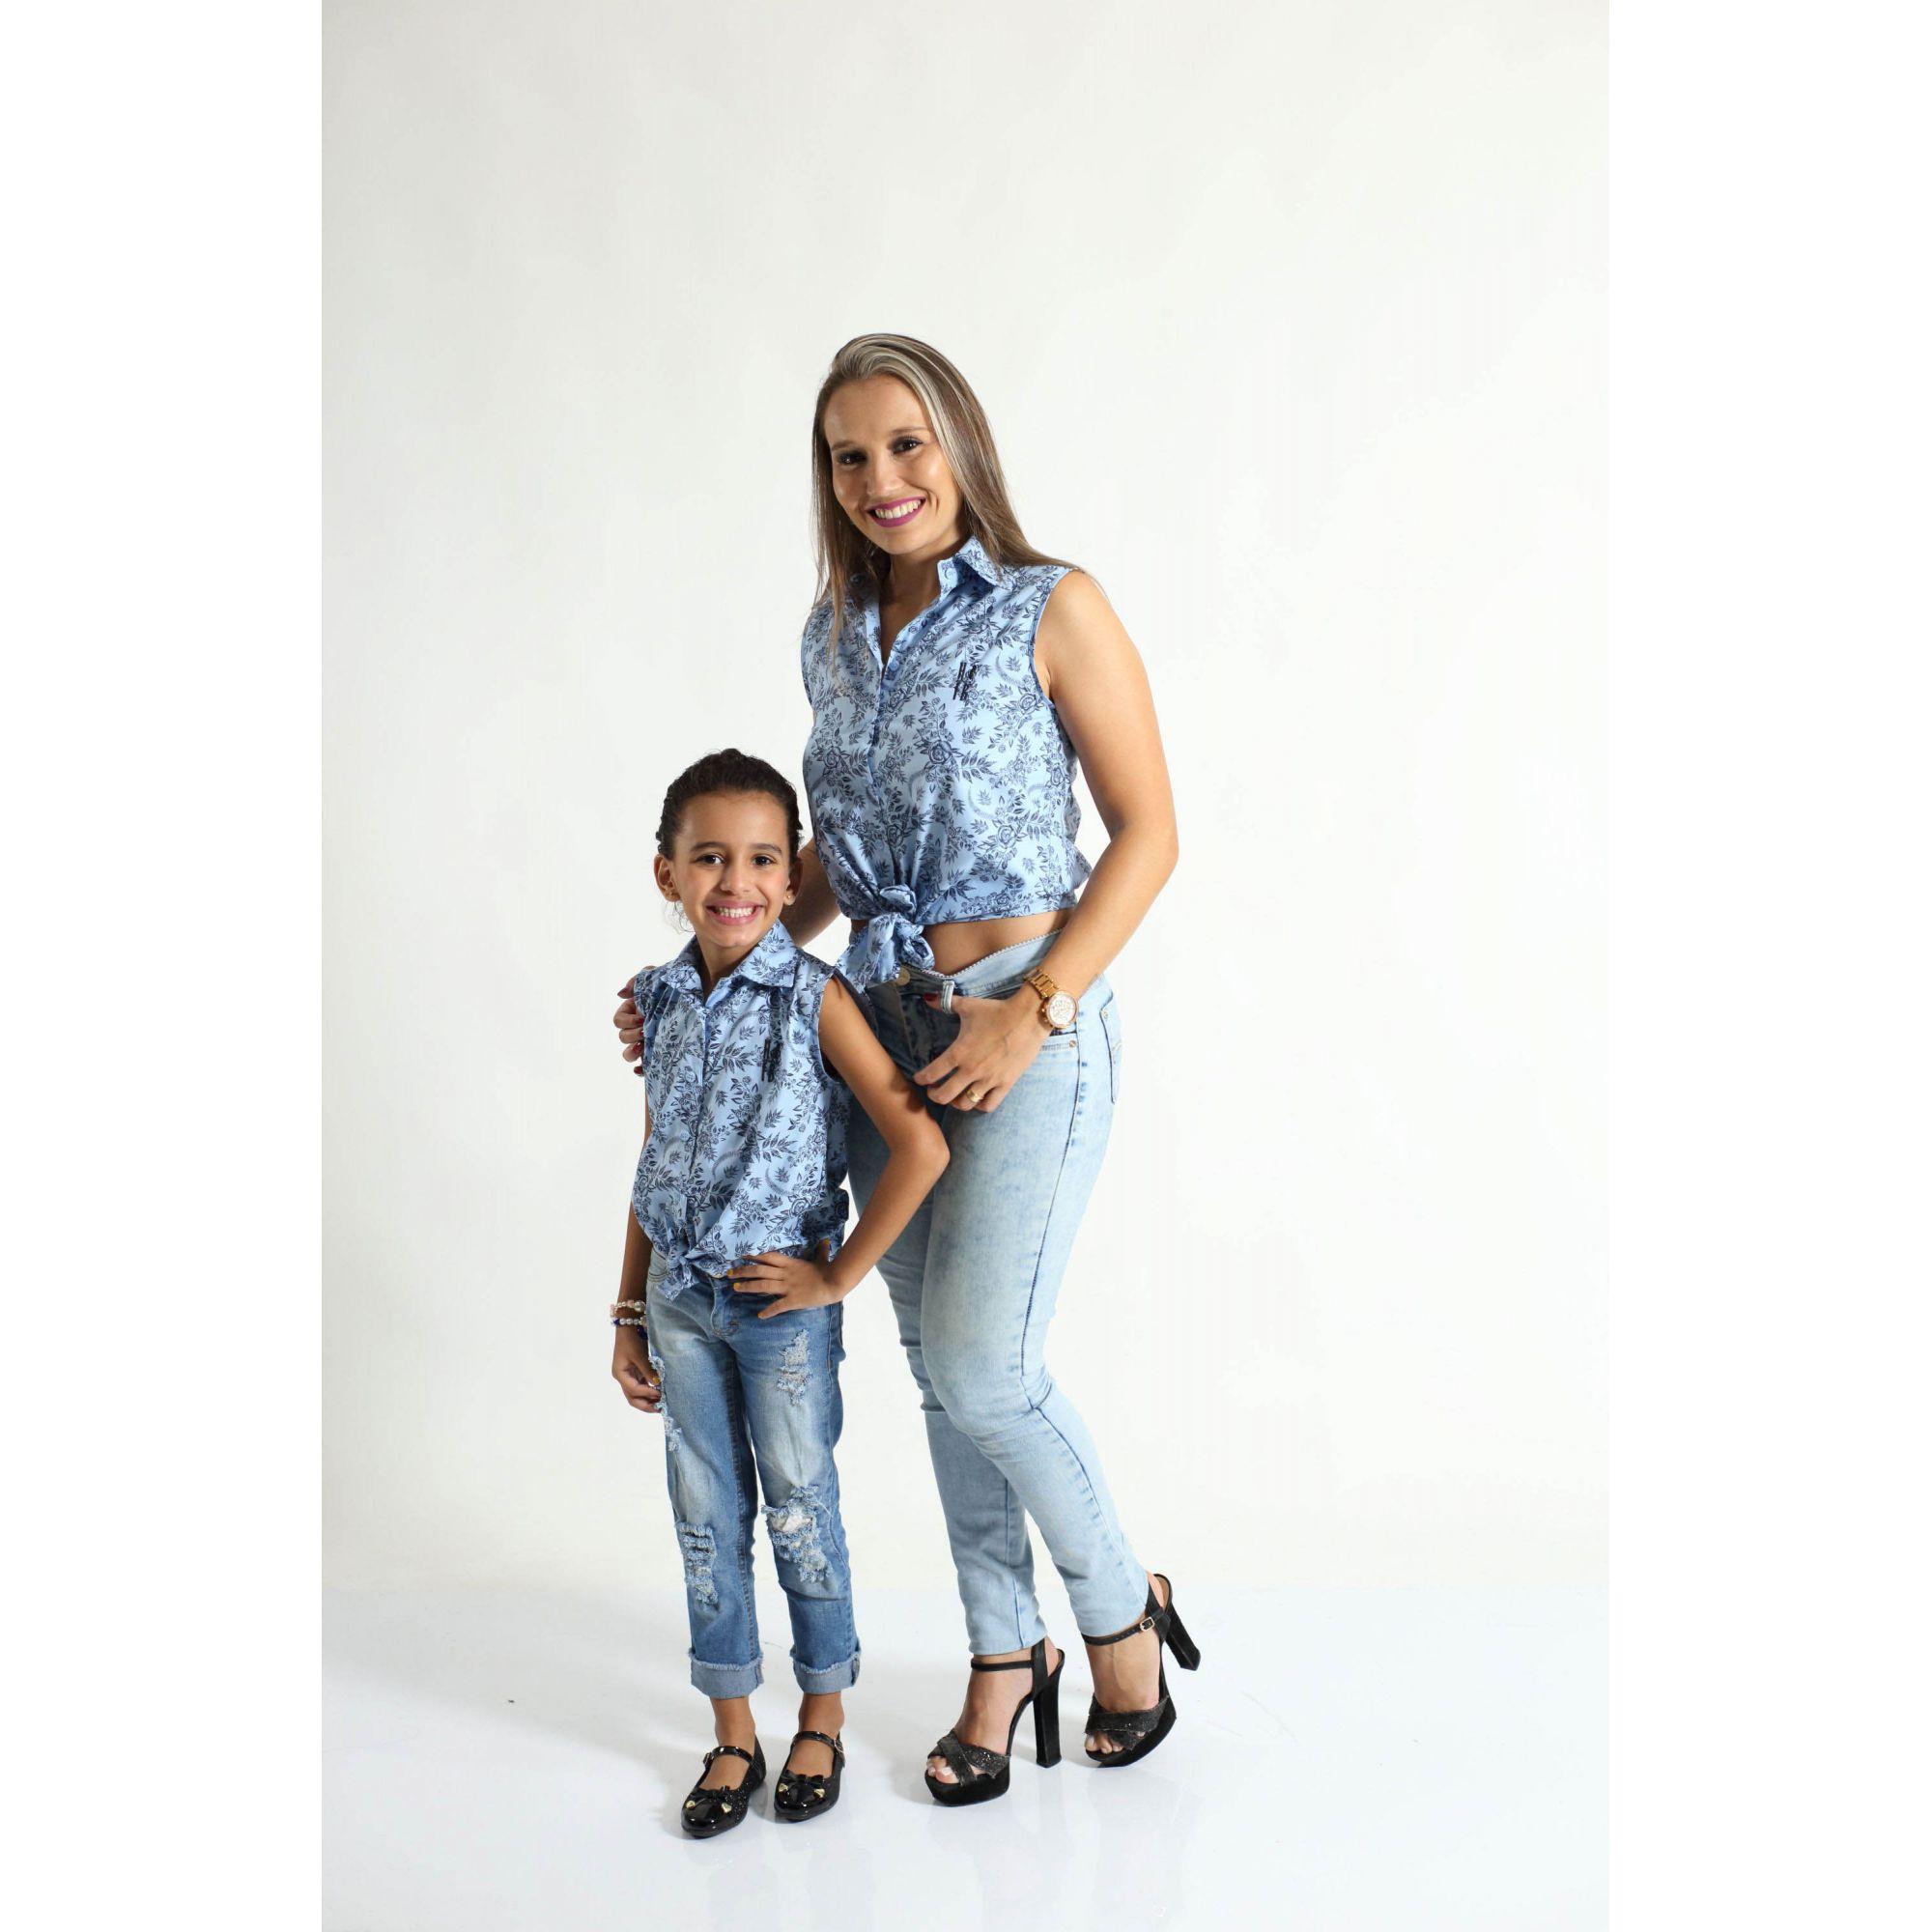 MÃE E FILHA > Kit 02 Camisas Social Adulto e Infantil Azul Floral [Coleção Tal Mãe Tal Filha]